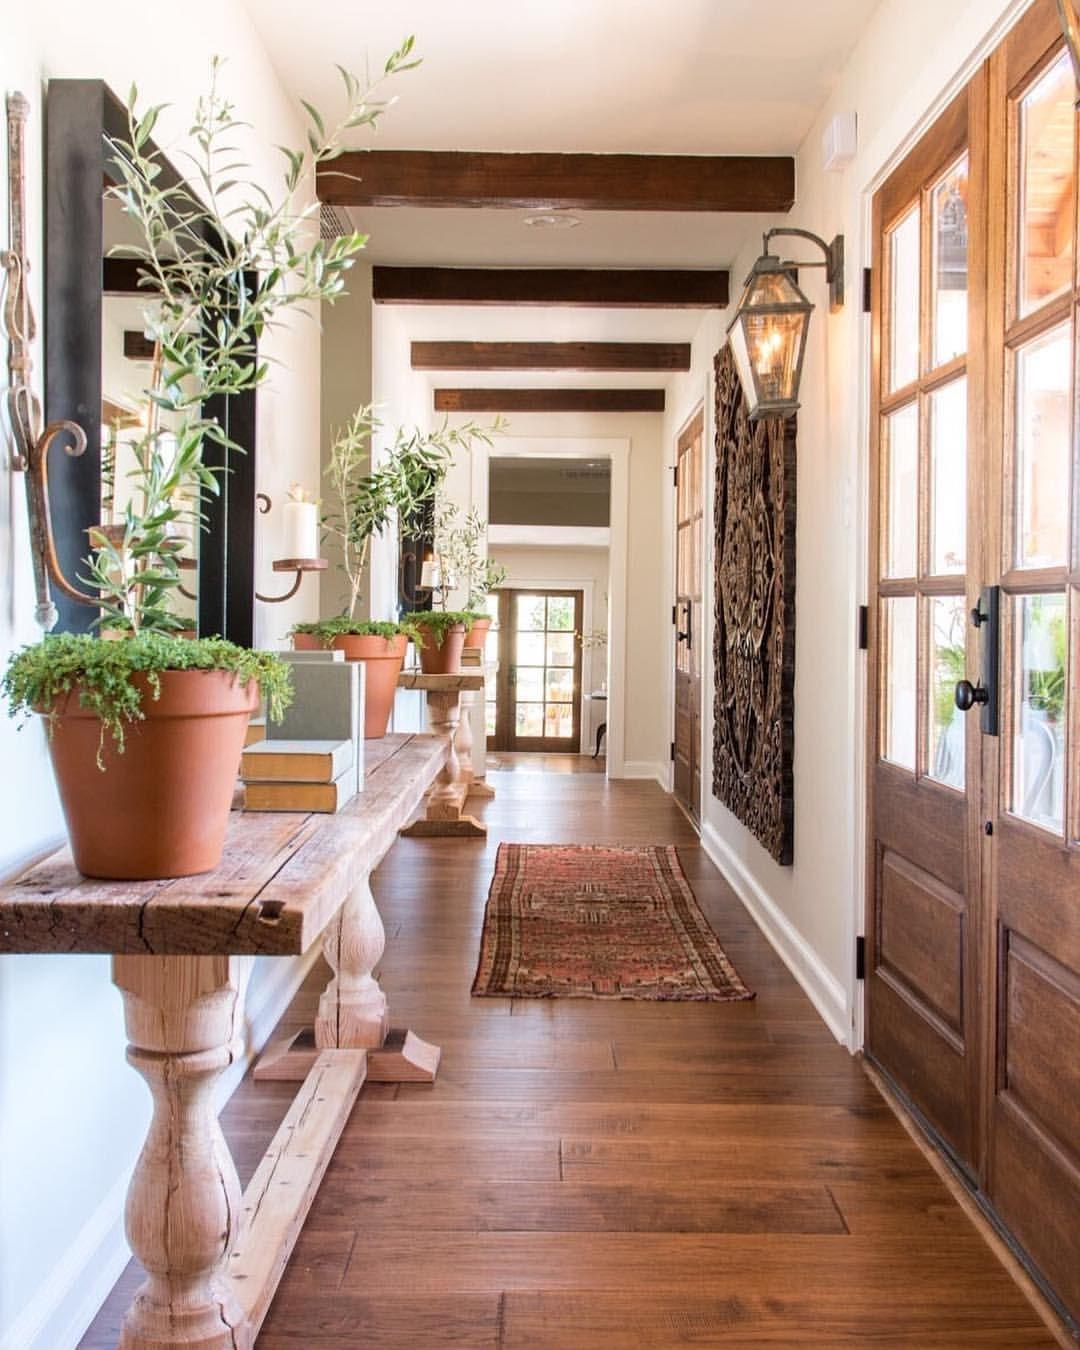 Joanna gaines hallway decor   k likerklikk  kommentarer u Joanna Stevens Gaines